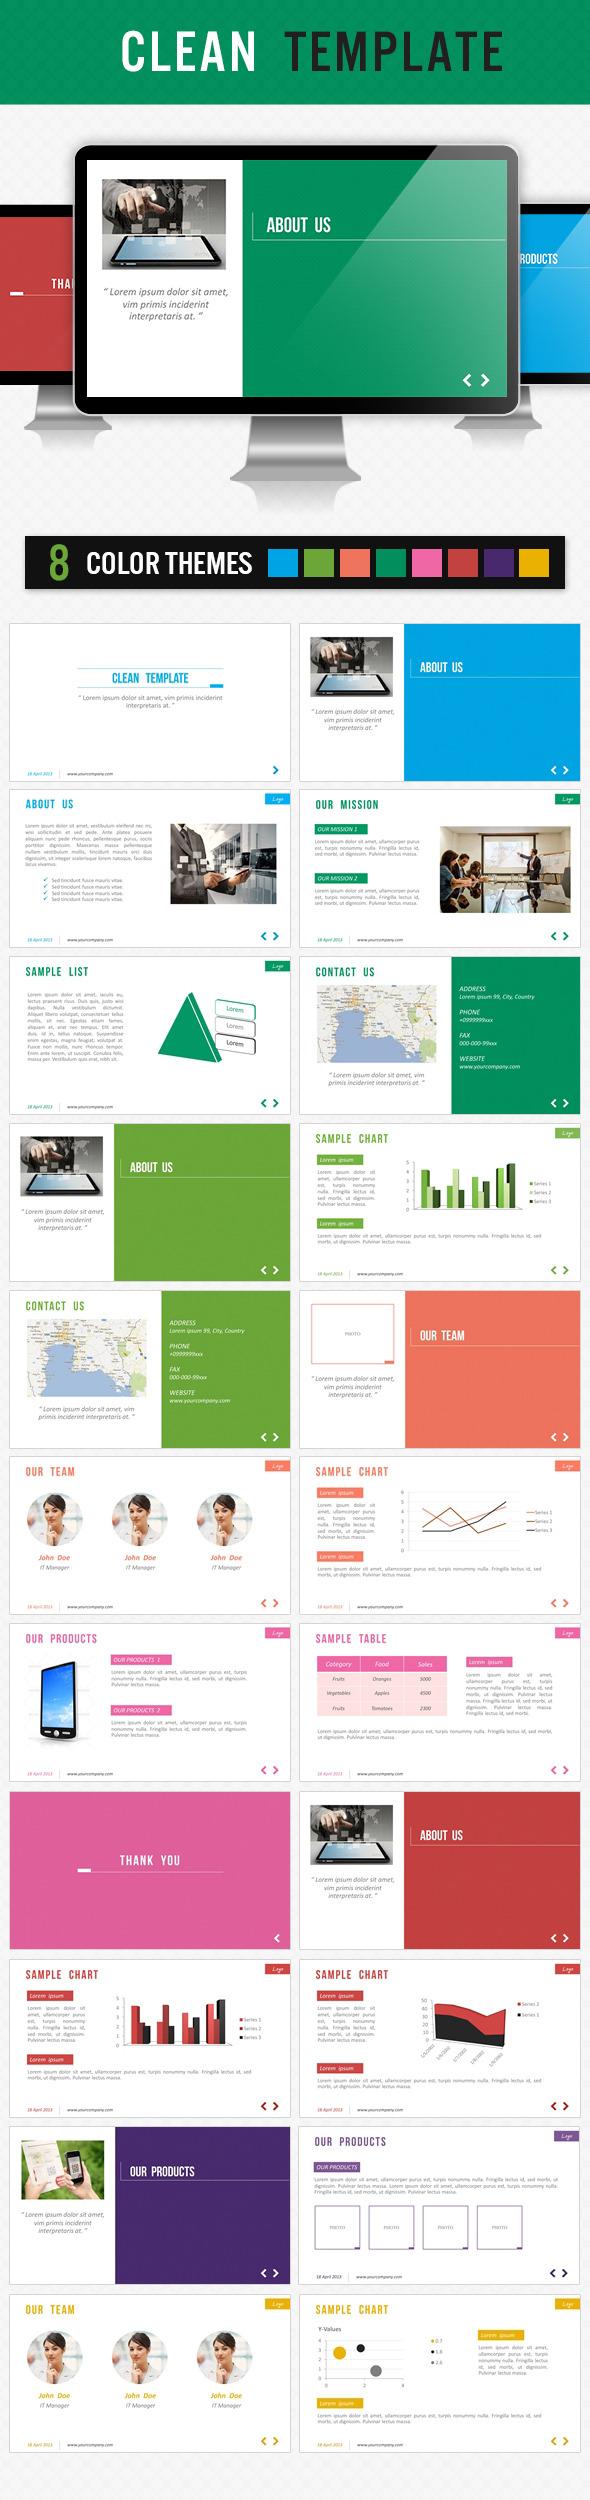 Clean Template - Presentation Templates